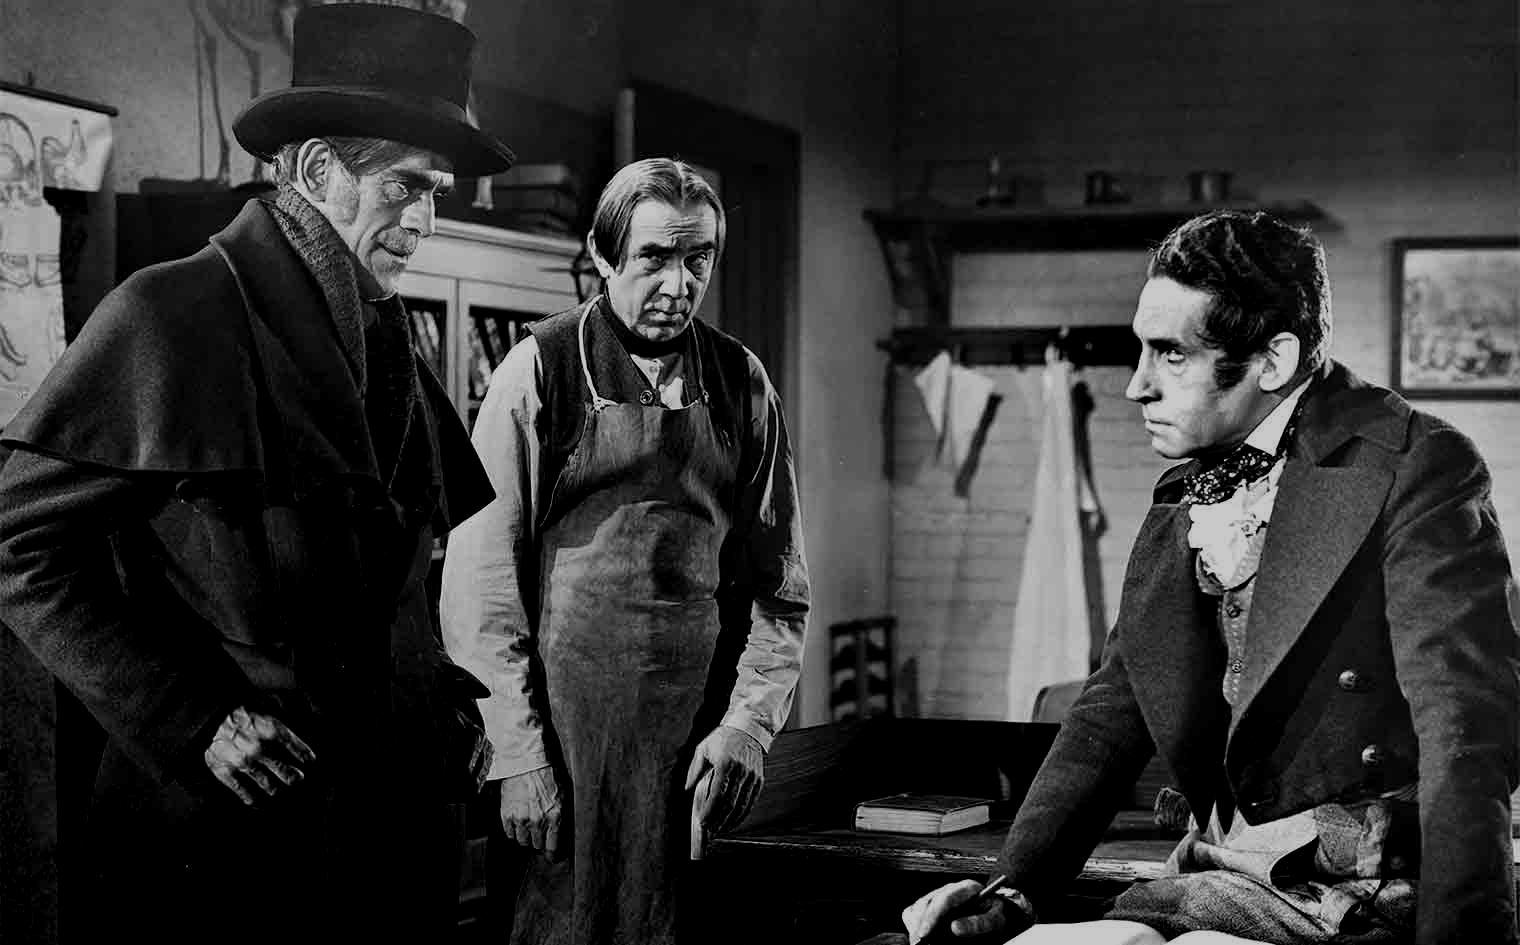 (l to r) John Gray (Boris Karloff), Joseph (Bela Lugosi) and Dr MacFarlane (Henry Daniell) in The Body Snatcher (1945)